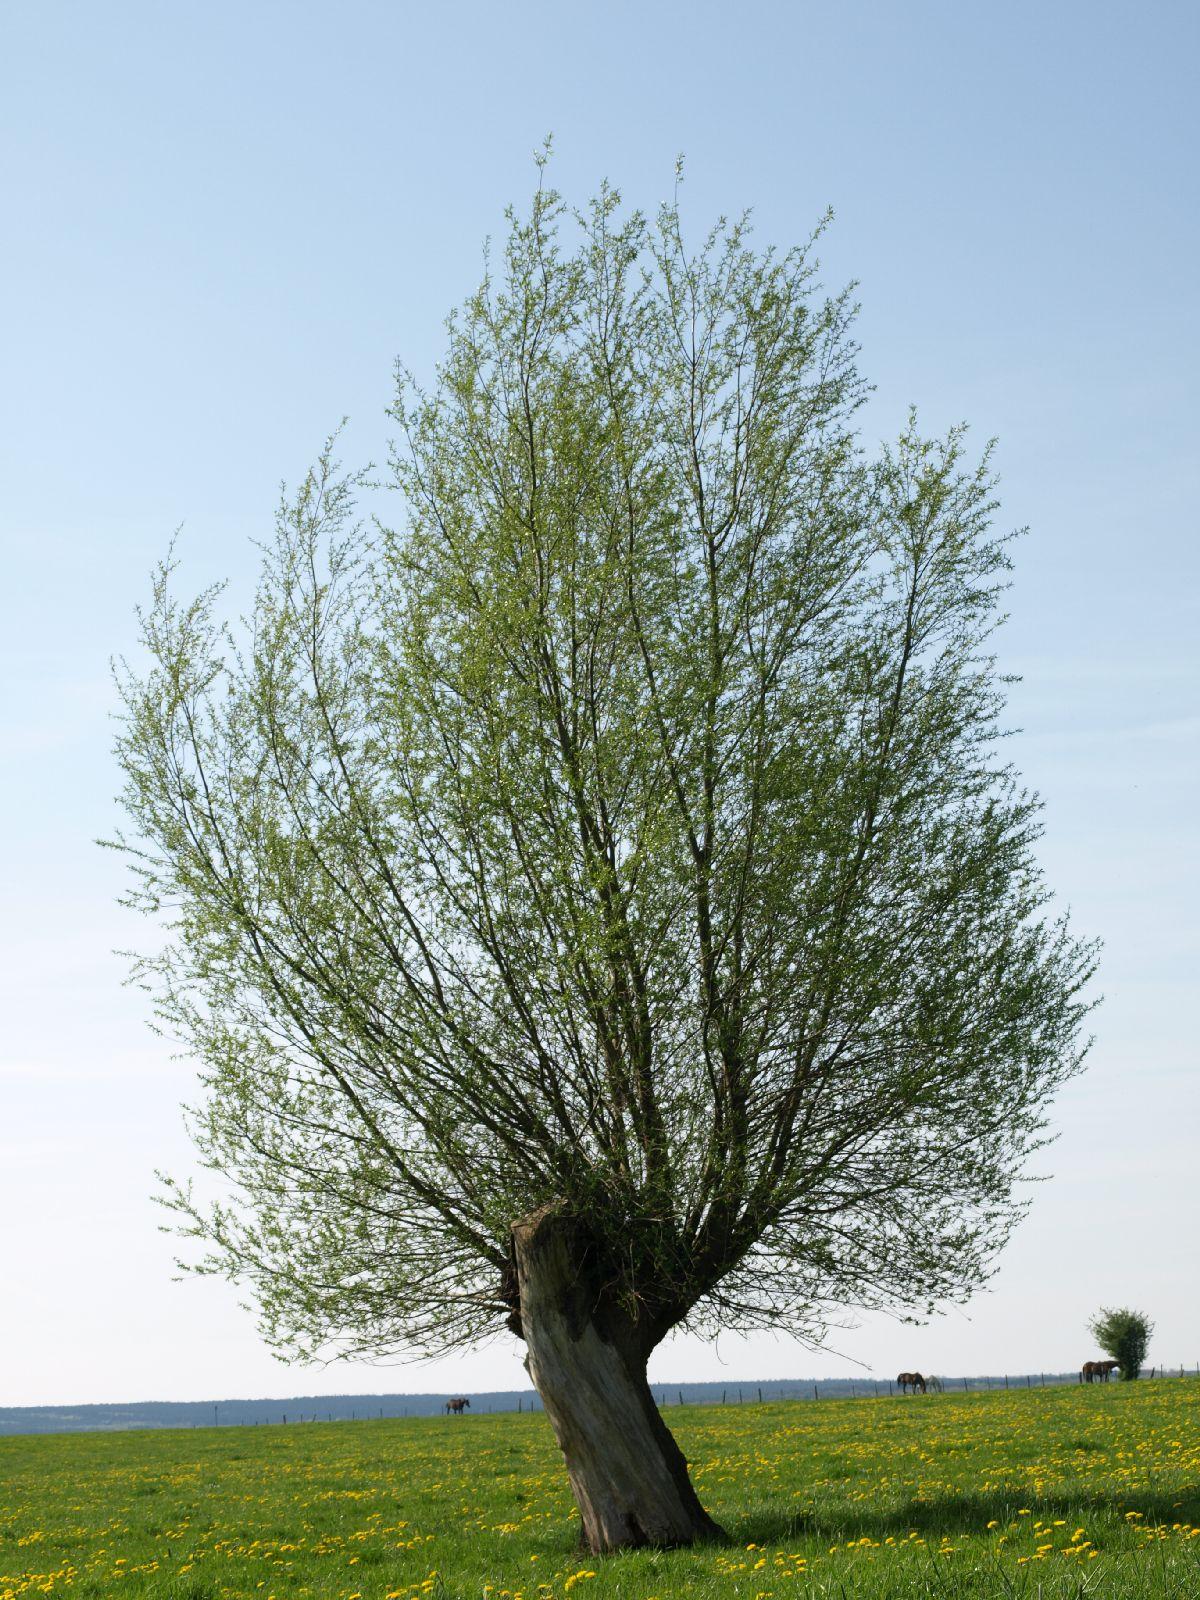 Pflanzen-Baum-Foto_Textur_B_P5042373